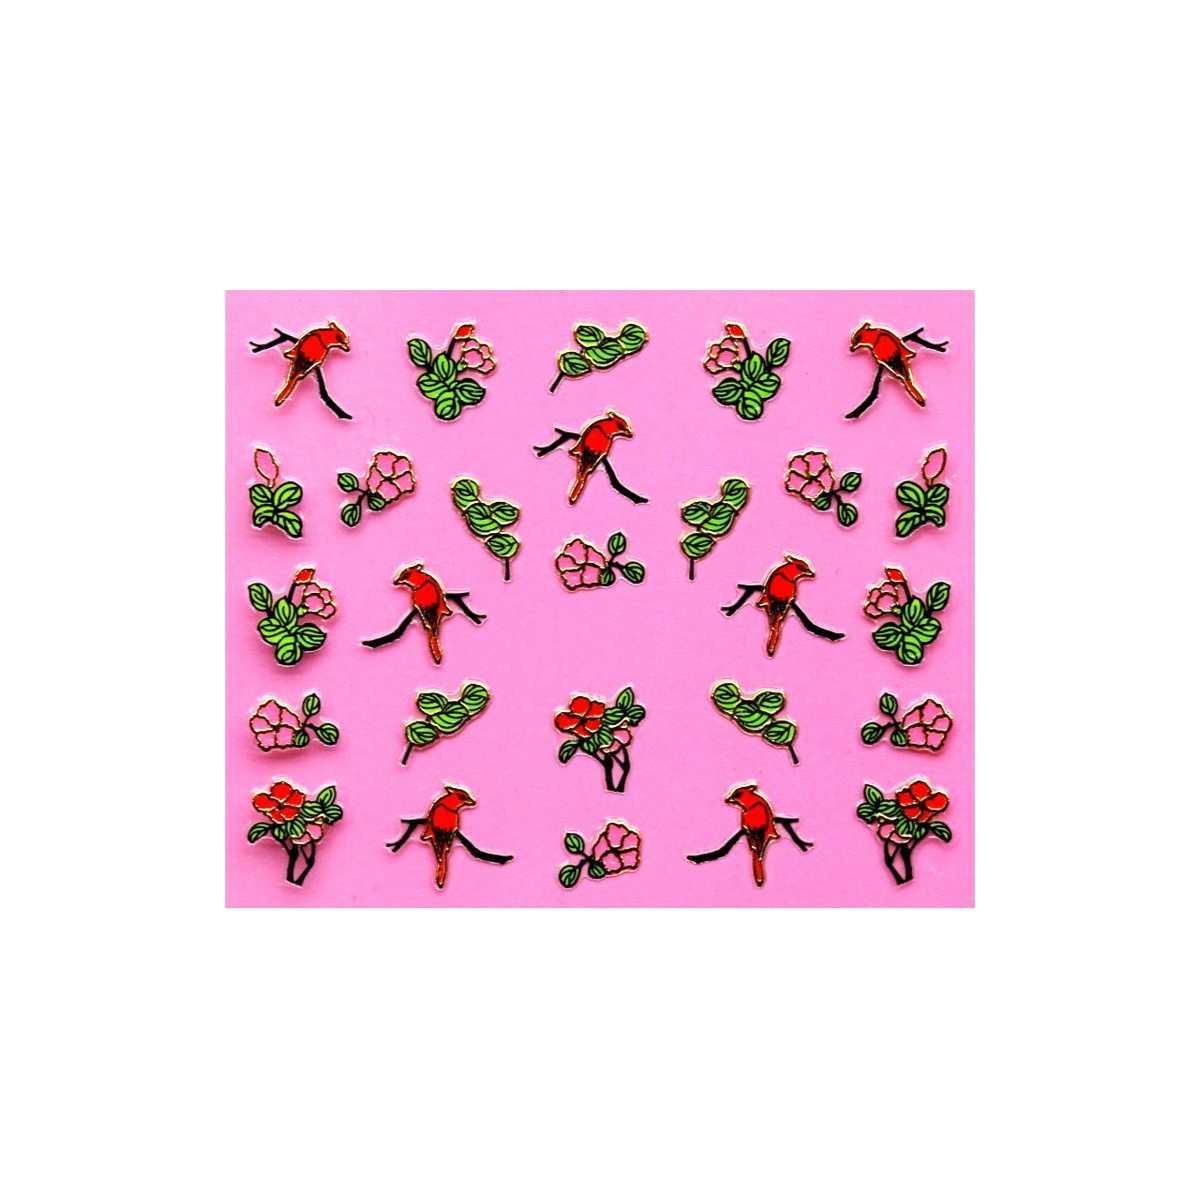 https://www.kit-manucure.com/783-thickbox_default/stickers-oiseaux-et-fleurs.jpg